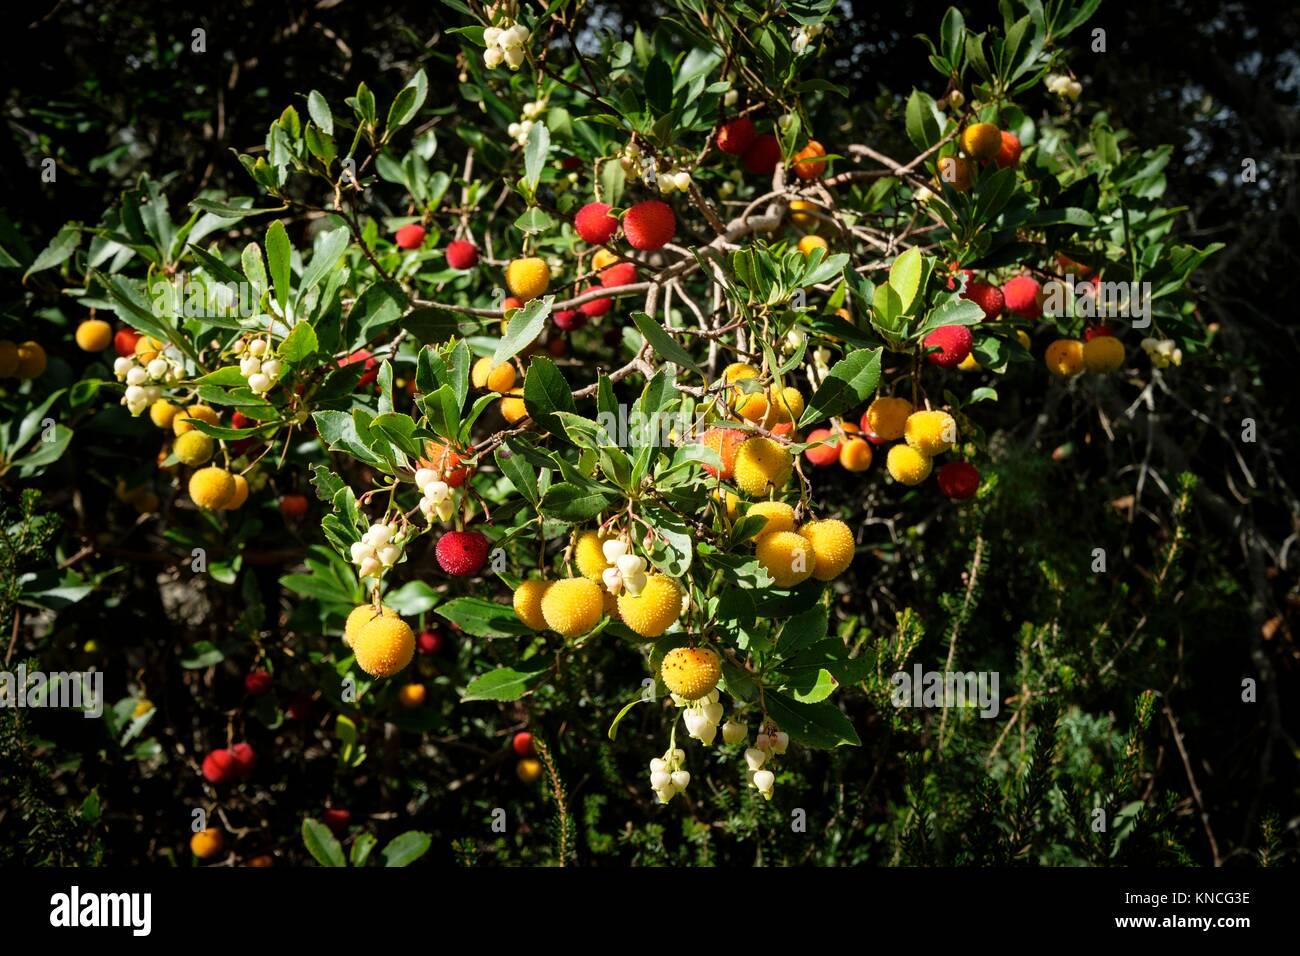 Comuna de Bunyola, communal land, Bunyola, Mallorca, balearic islands, spain, europe. - Stock Image